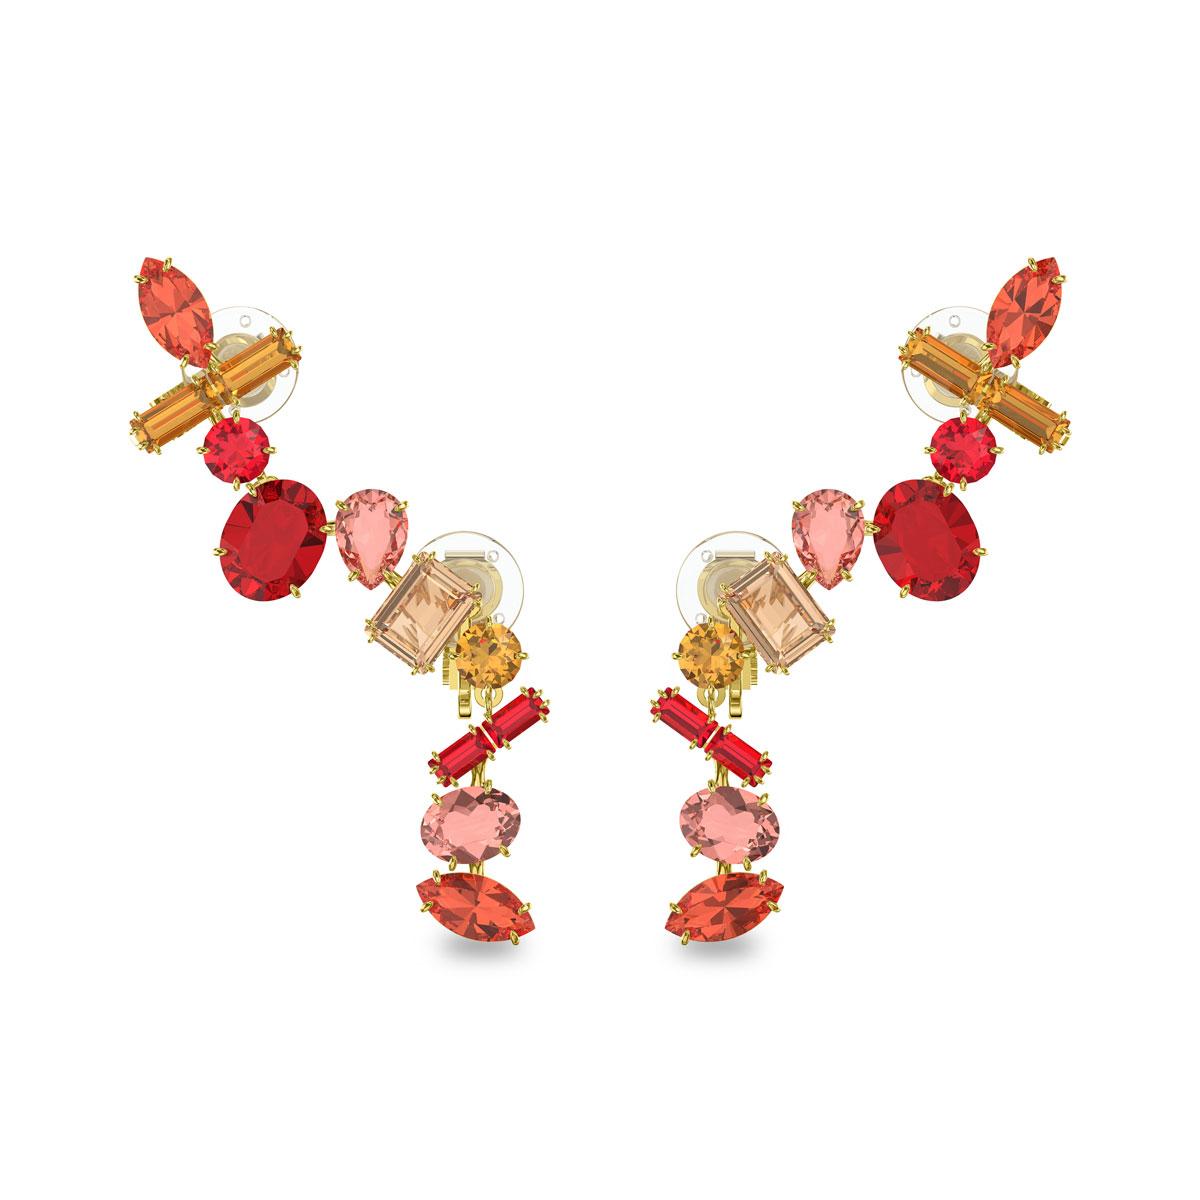 Swarovski Gema Earrings, Multicolored, Gold-Tone Plated, Pair